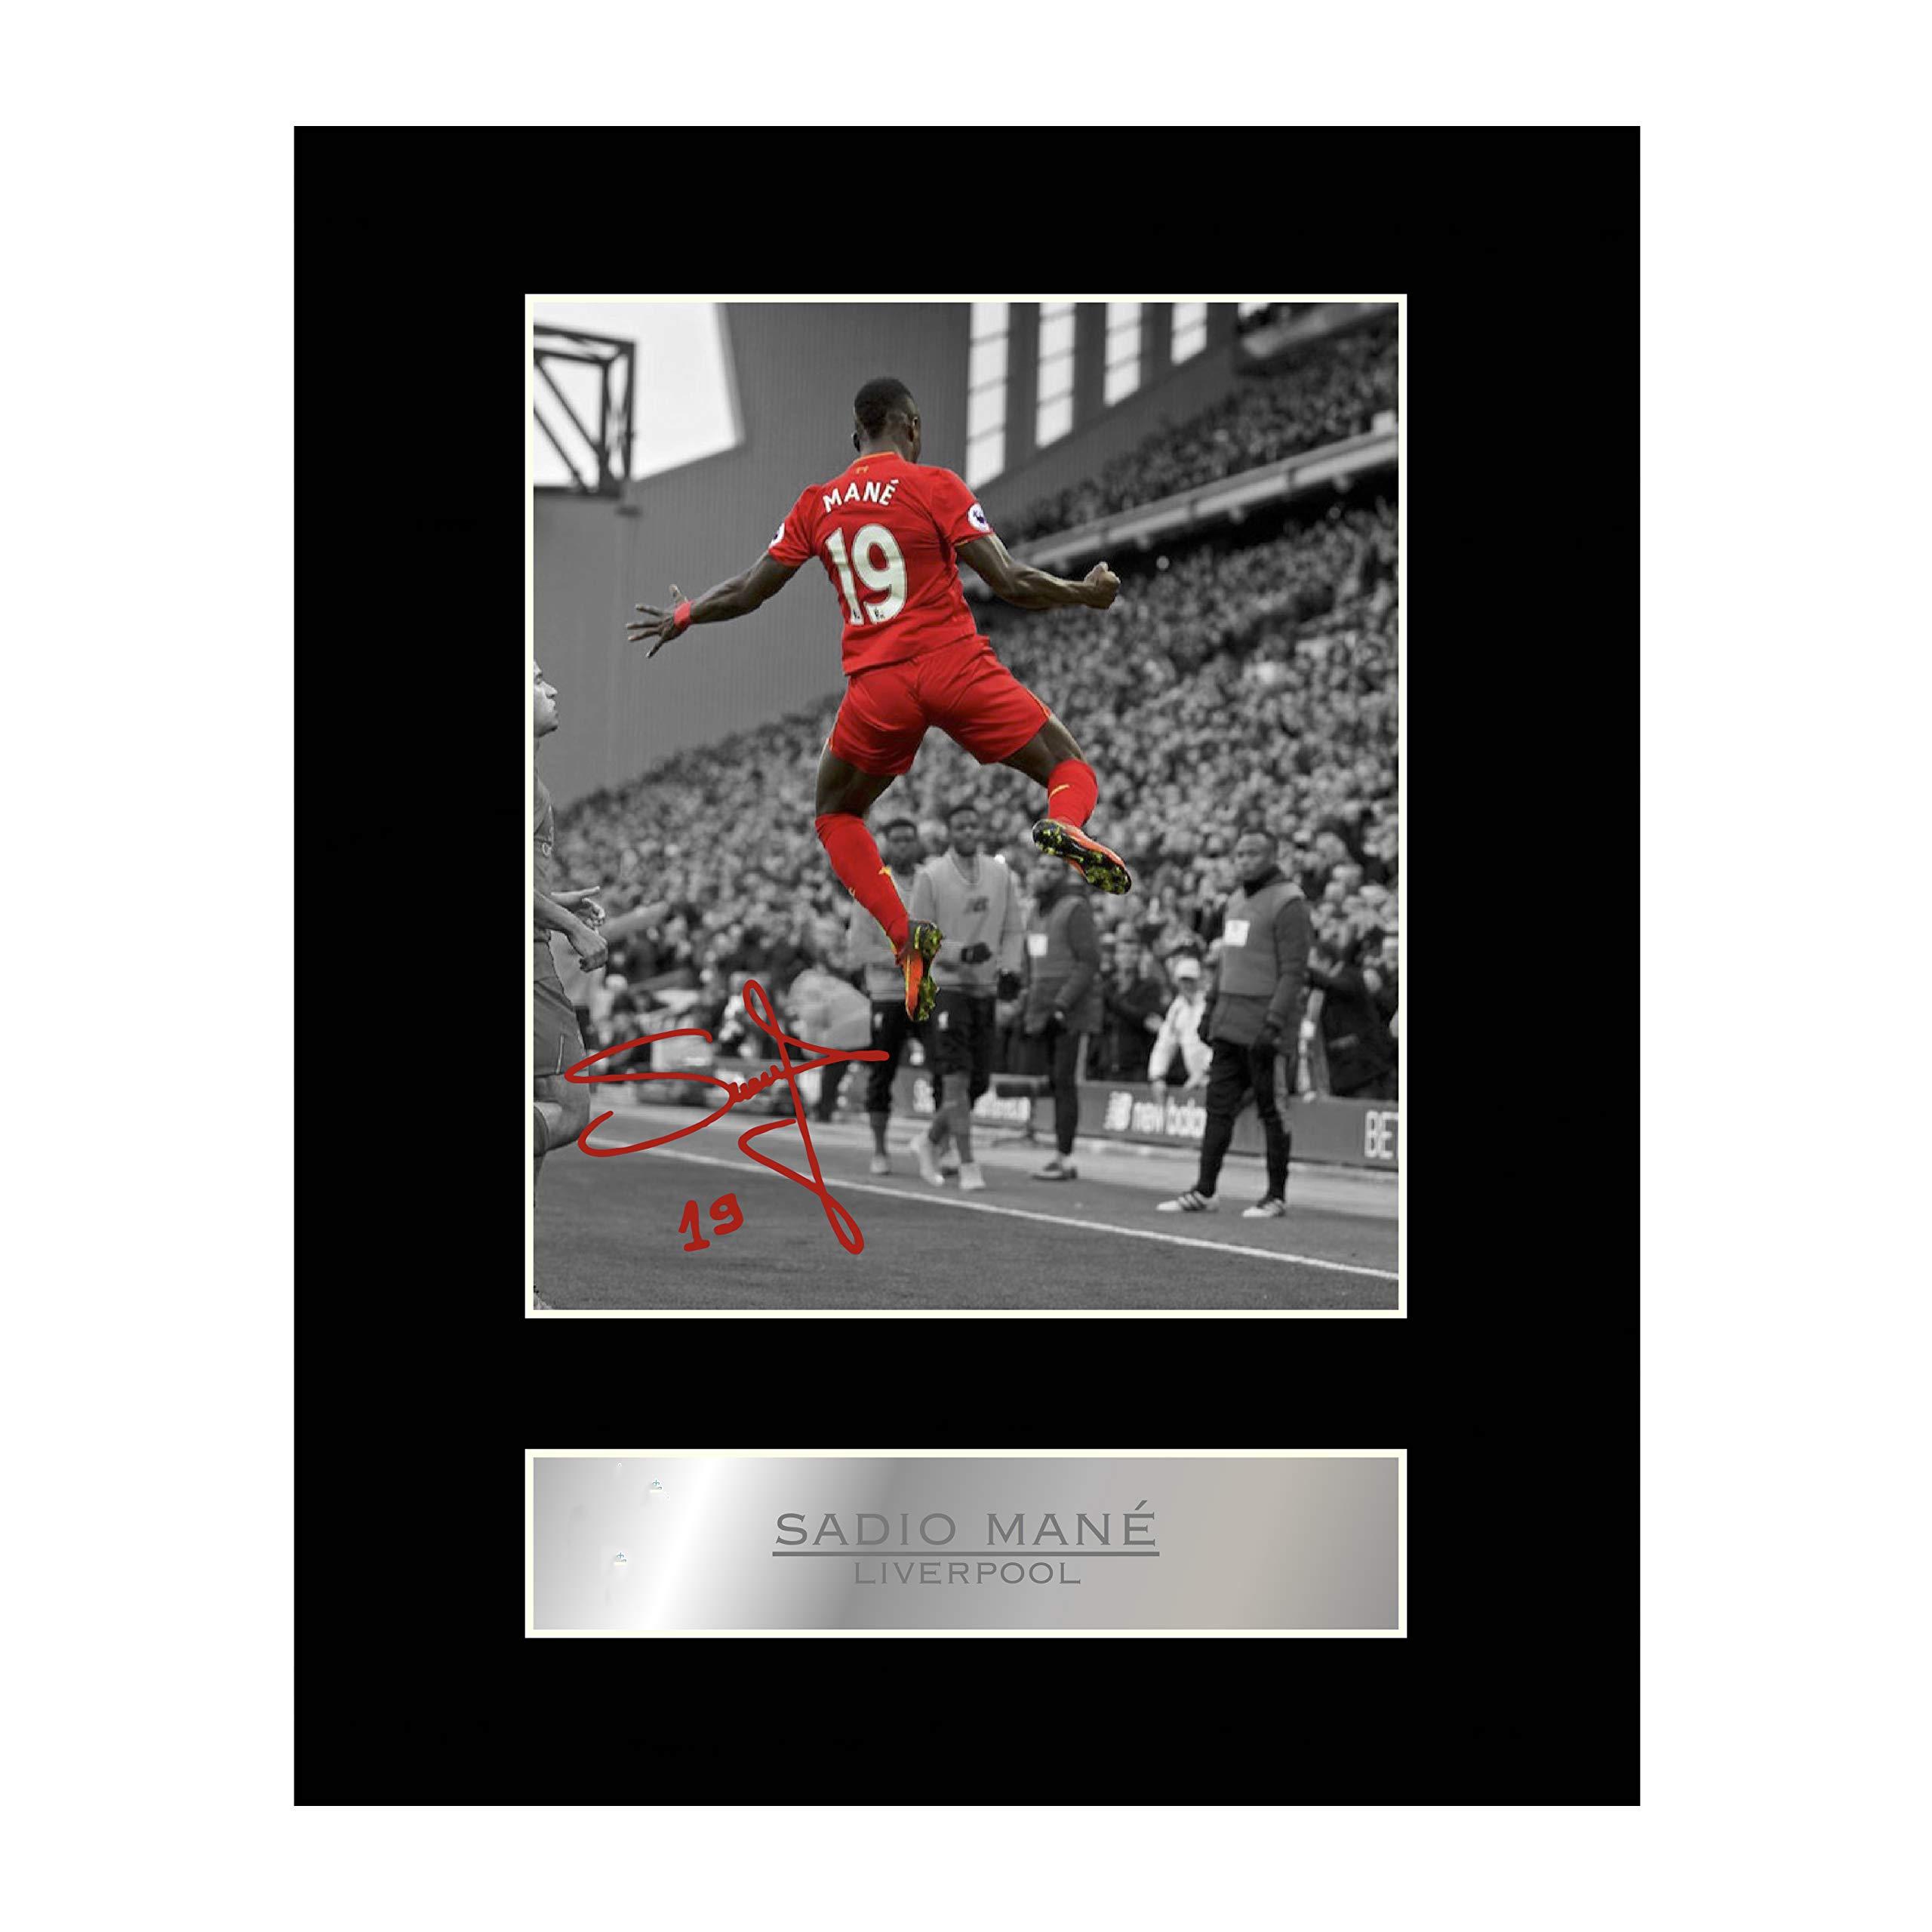 Sadio Mané Signed Mounted Photo Display Liverpool FC #2